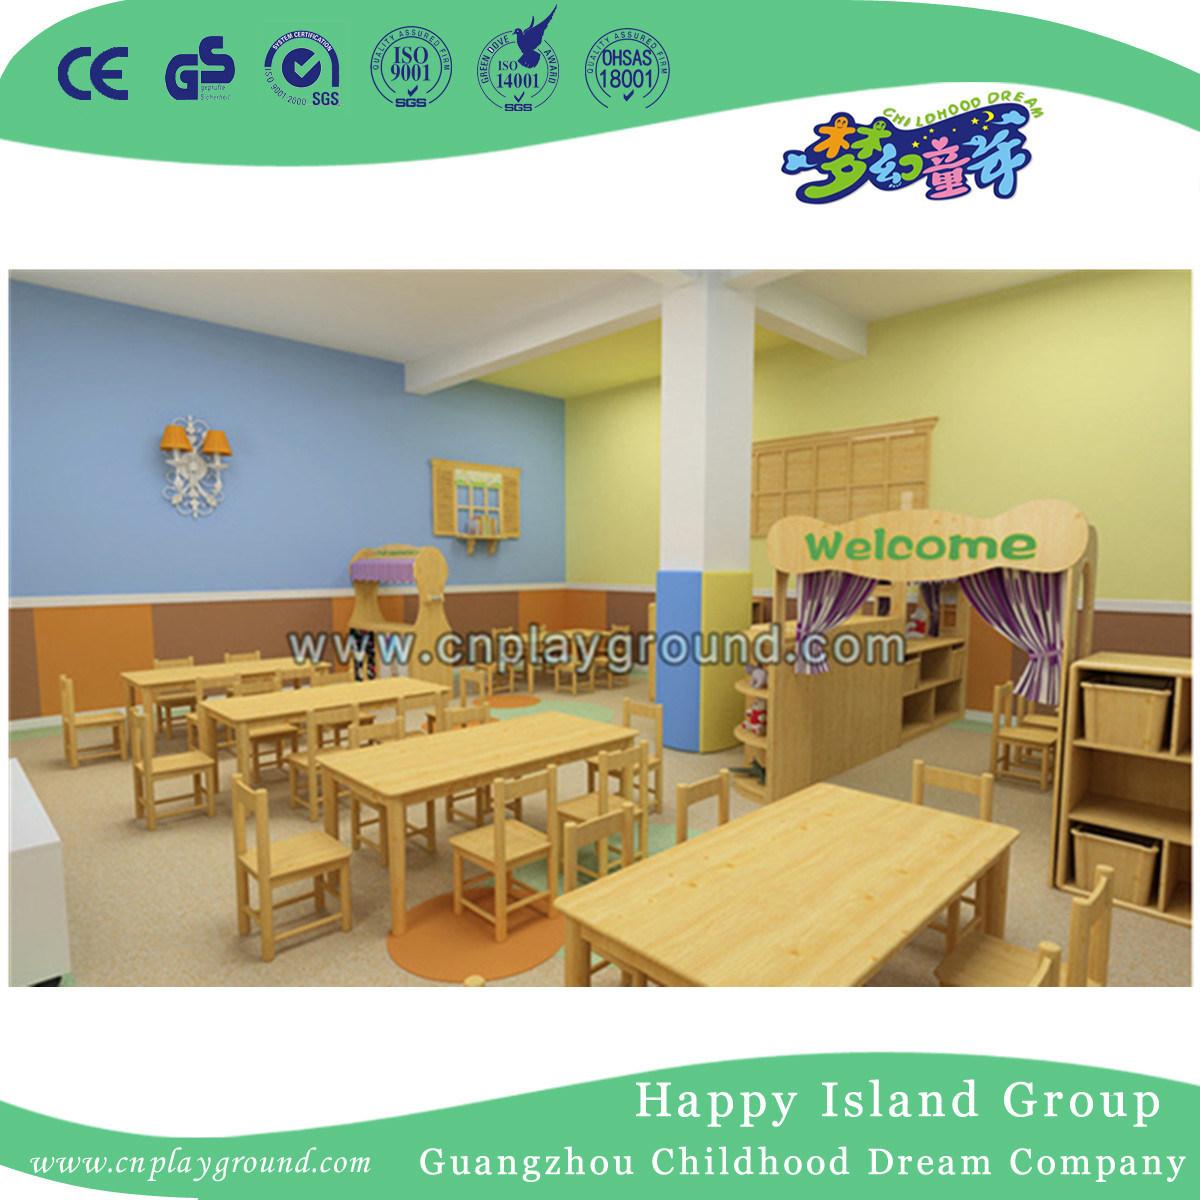 School Art Room Design Kids Desk Chairs For Sale (MSS 3 F)